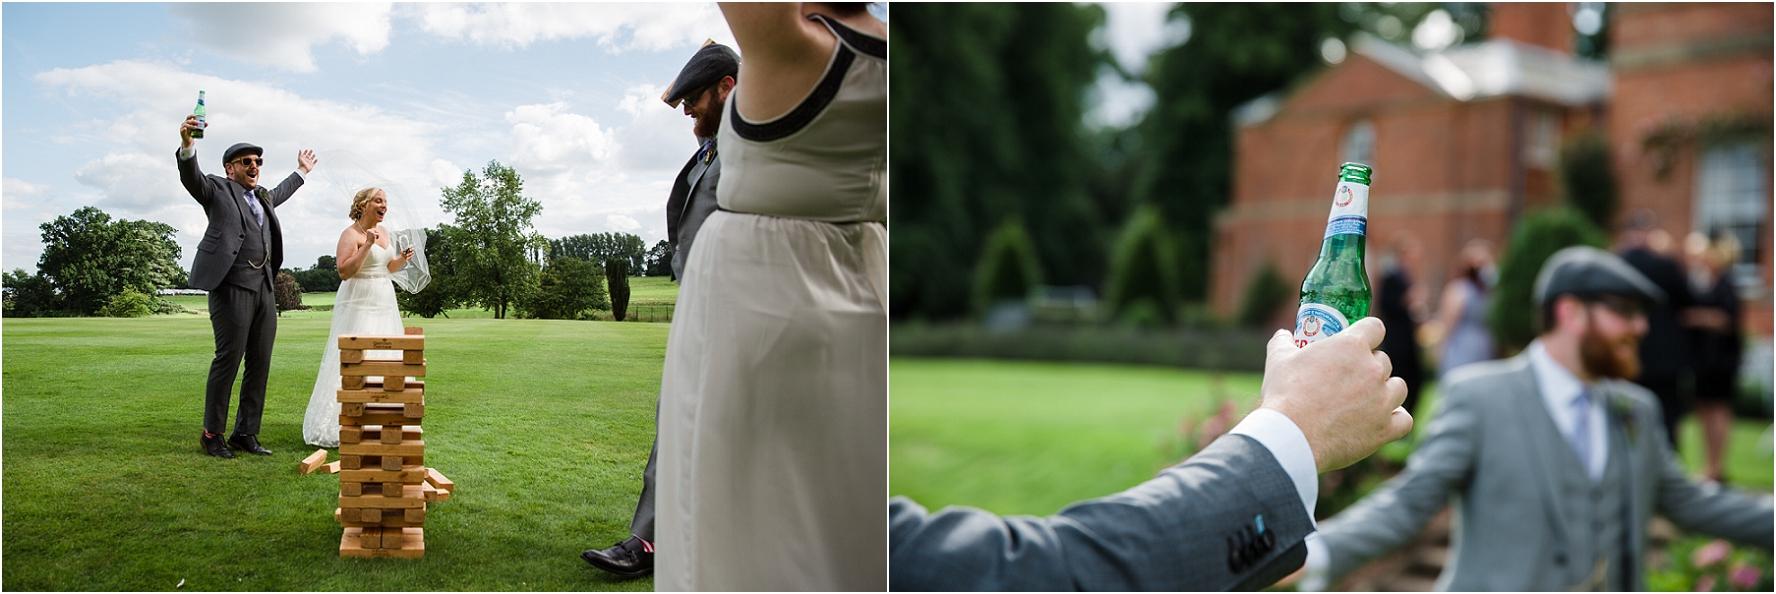 wedding-photography-the-orangery-settringham_0478